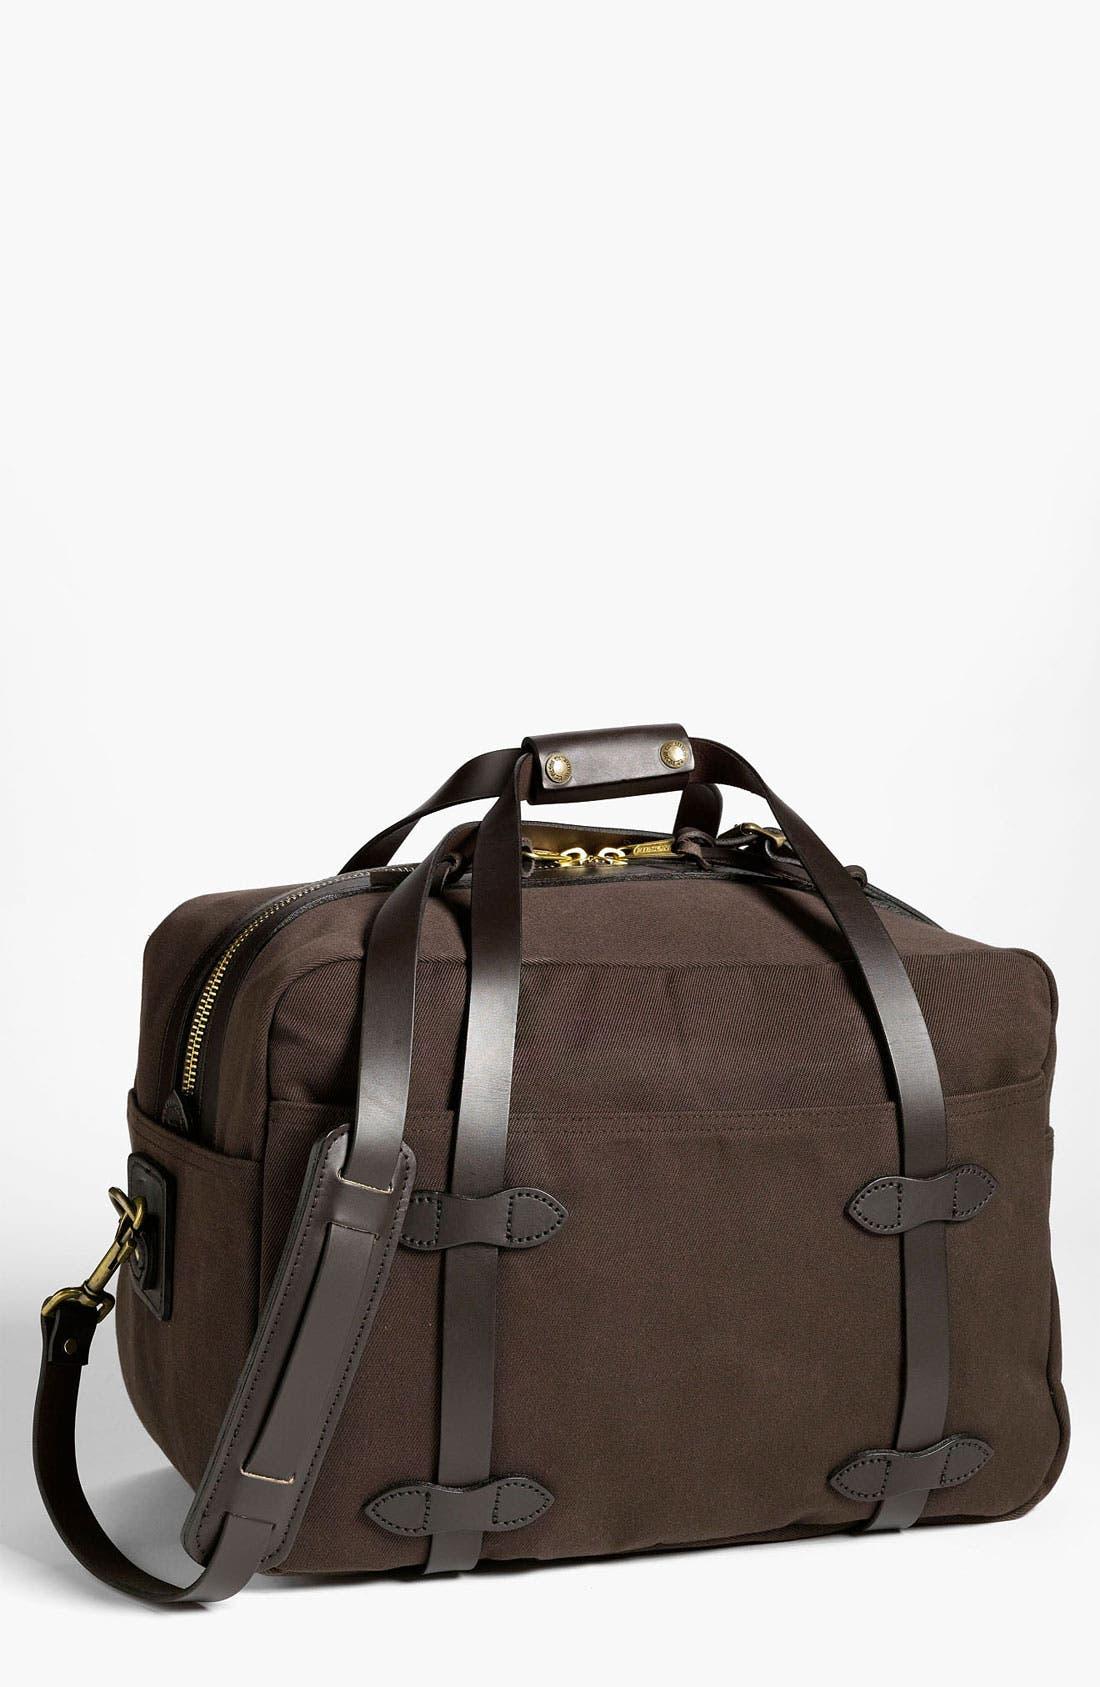 Medium Travel Bag,                             Main thumbnail 1, color,                             200